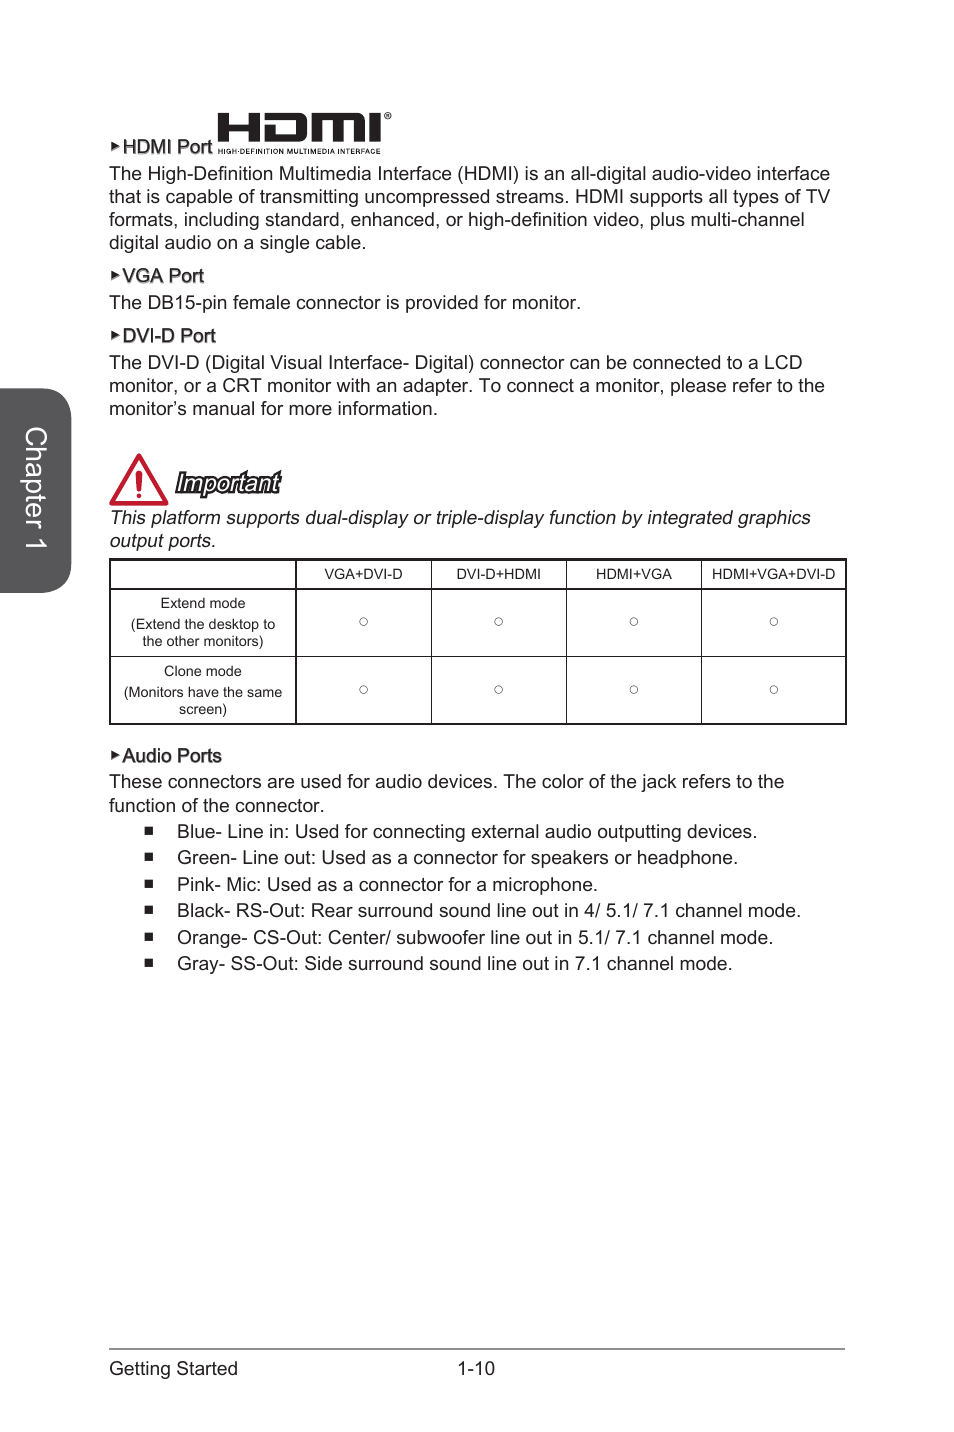 Chapter 1, Important | MSI Z97S SLI KRAIT EDITION Manual User Manual